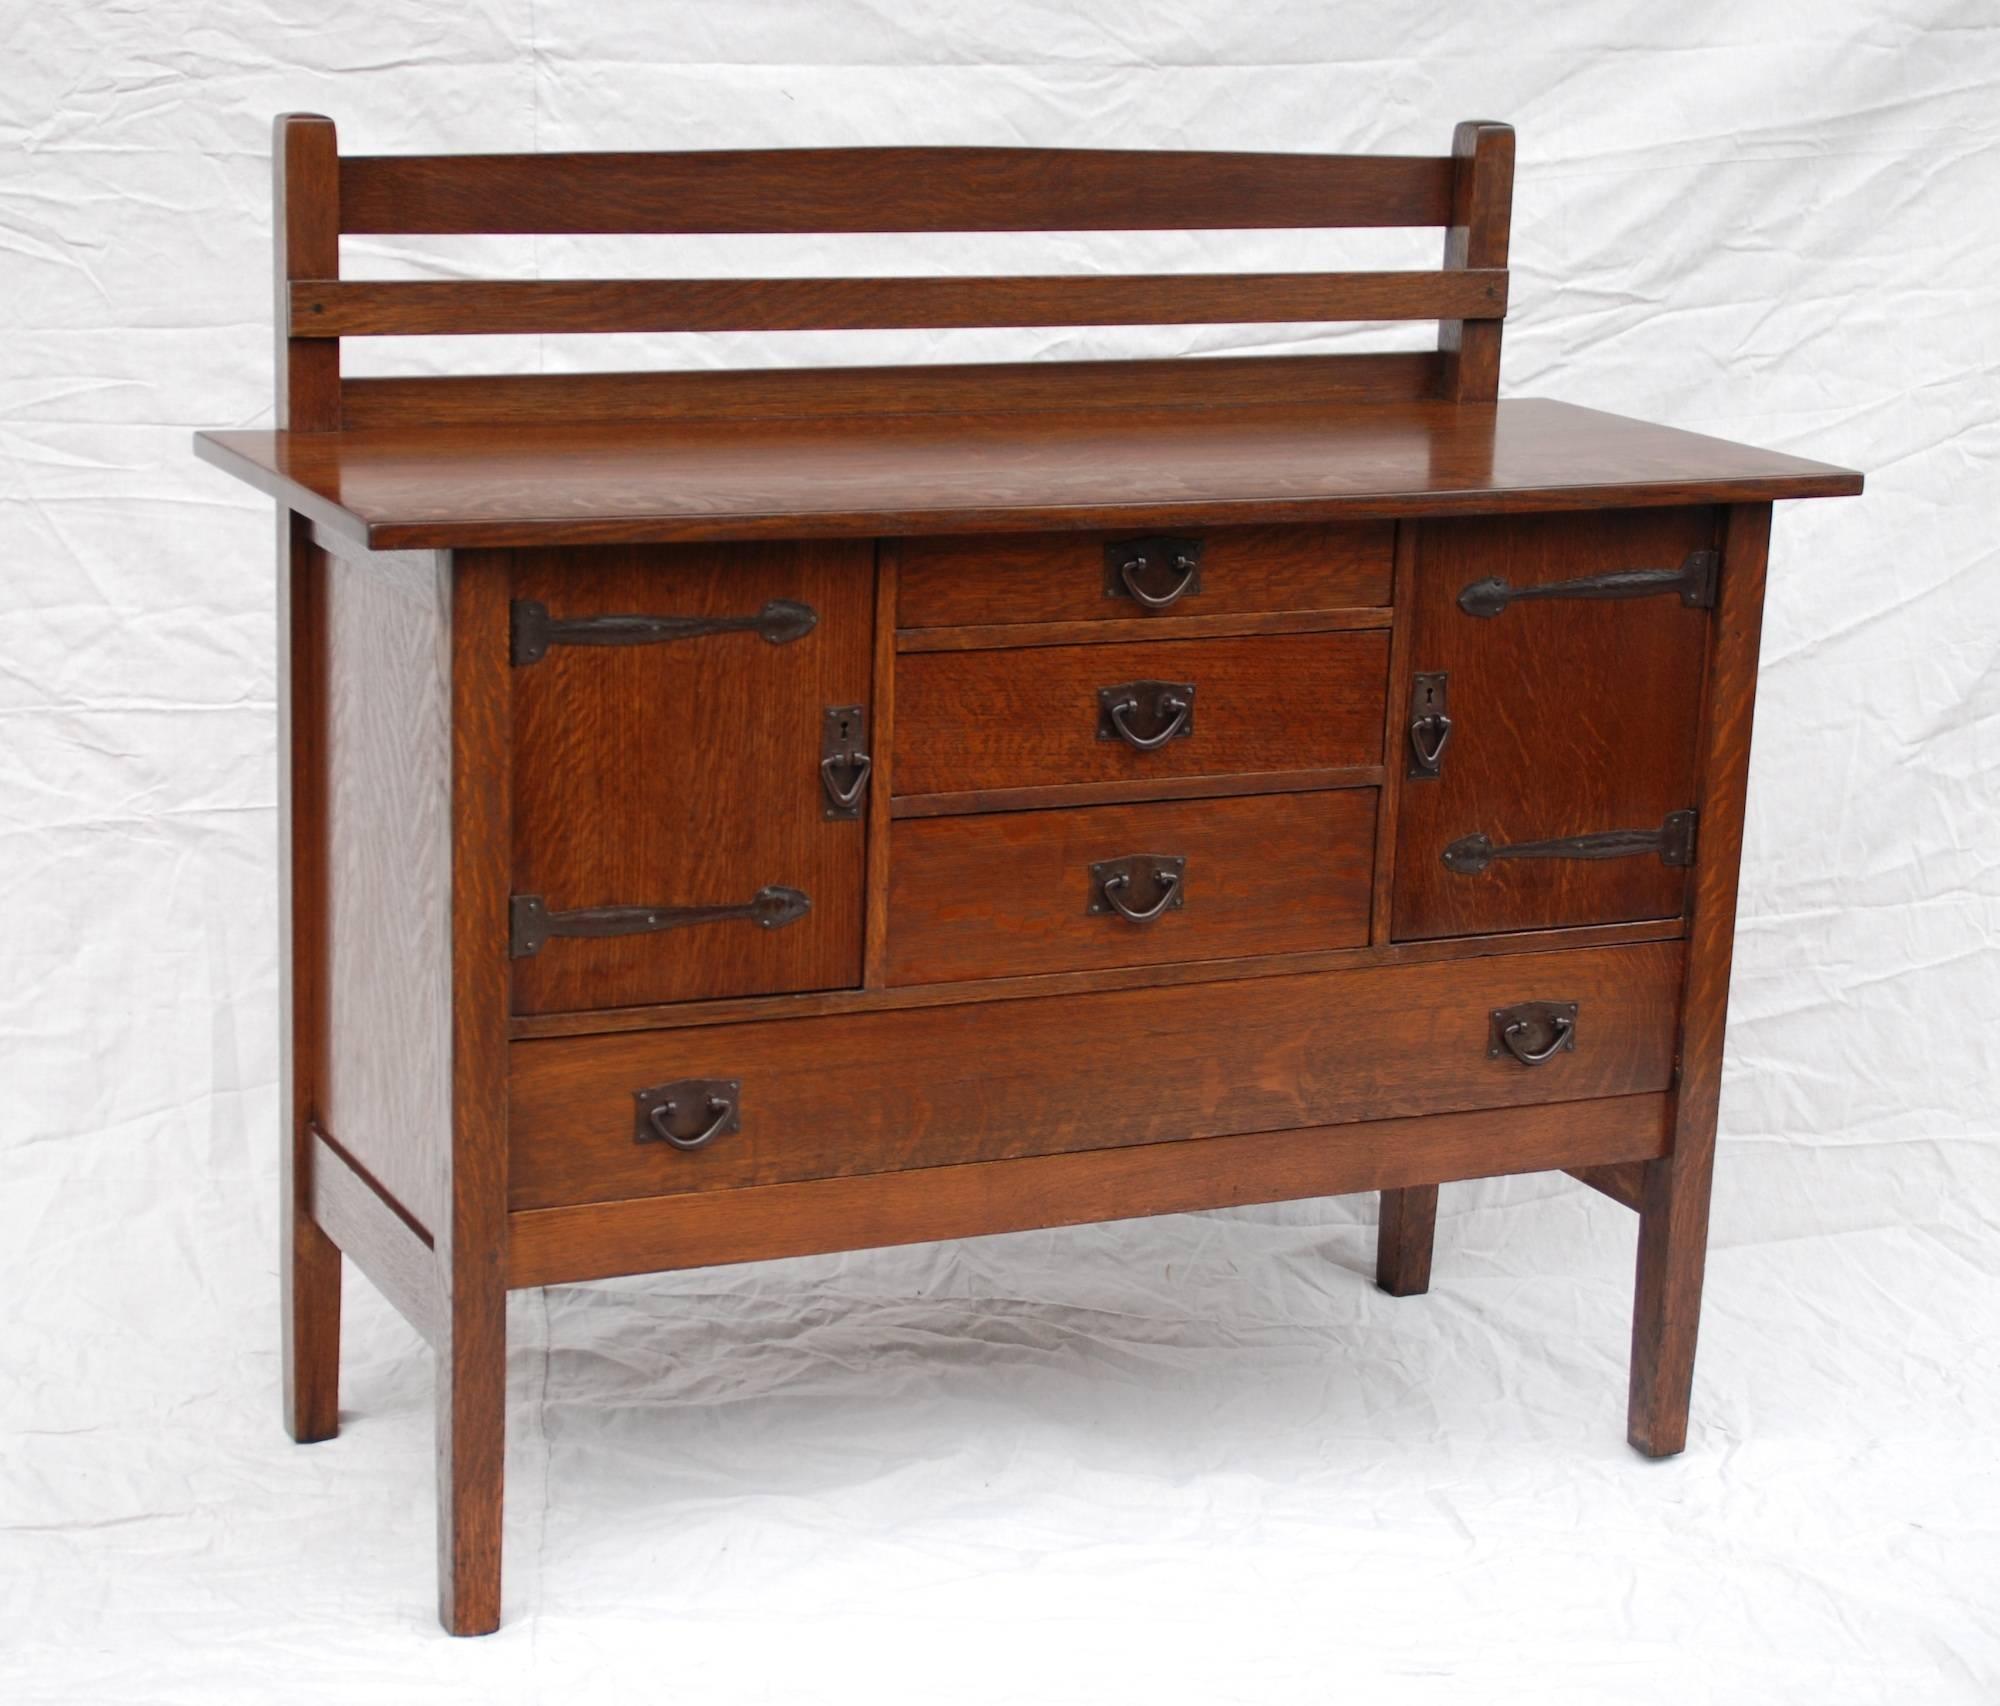 Voorhees Craftsman Mission Oak Furniture – Gustav Stickley Strap Within Stickley Sideboards (View 4 of 15)